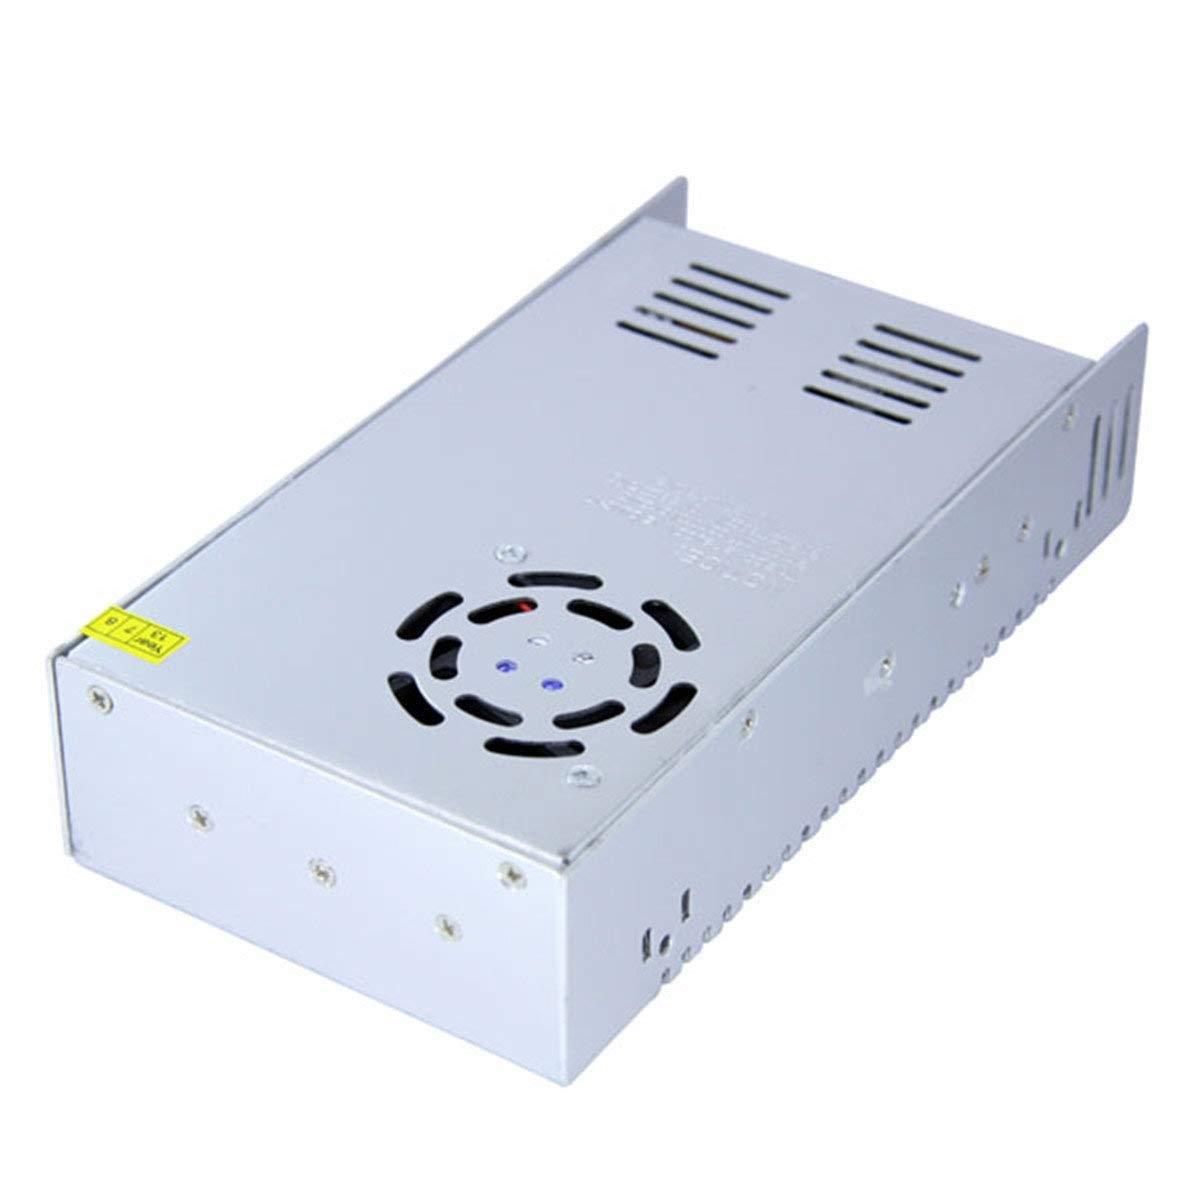 jiguoor AC 85-265V to DC 24V 15A 360W Driver Switch Power Supply Transformer for LED Strip Light